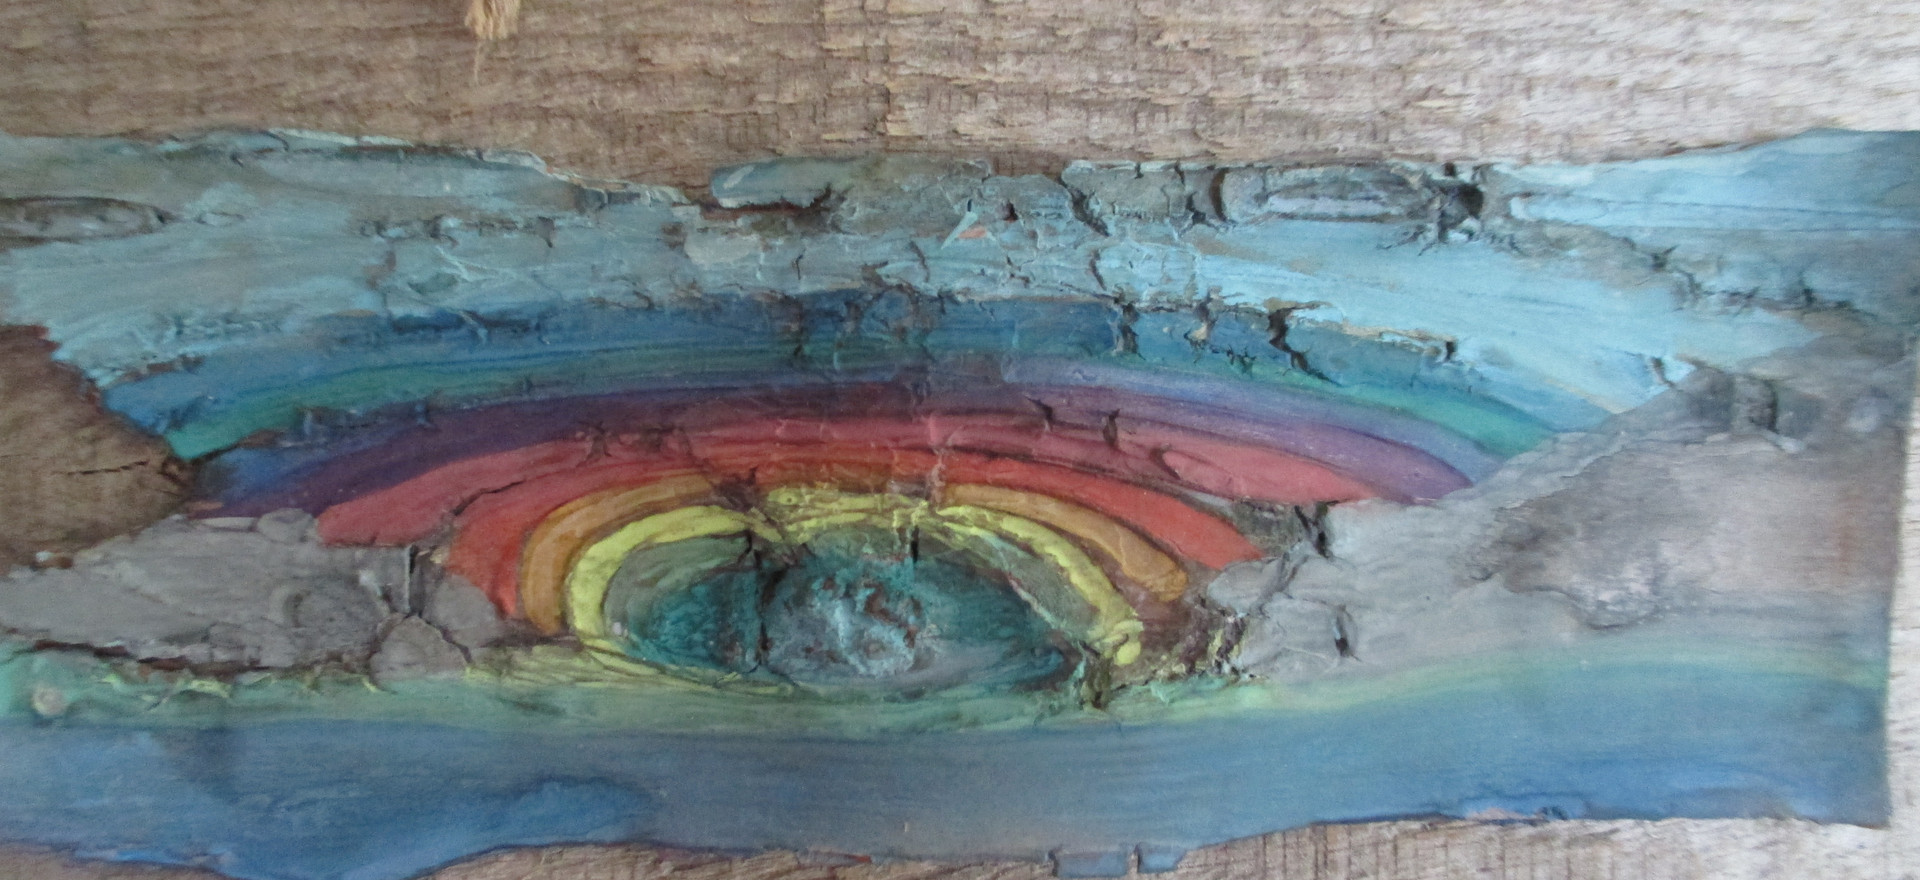 Watercolour on birch bark